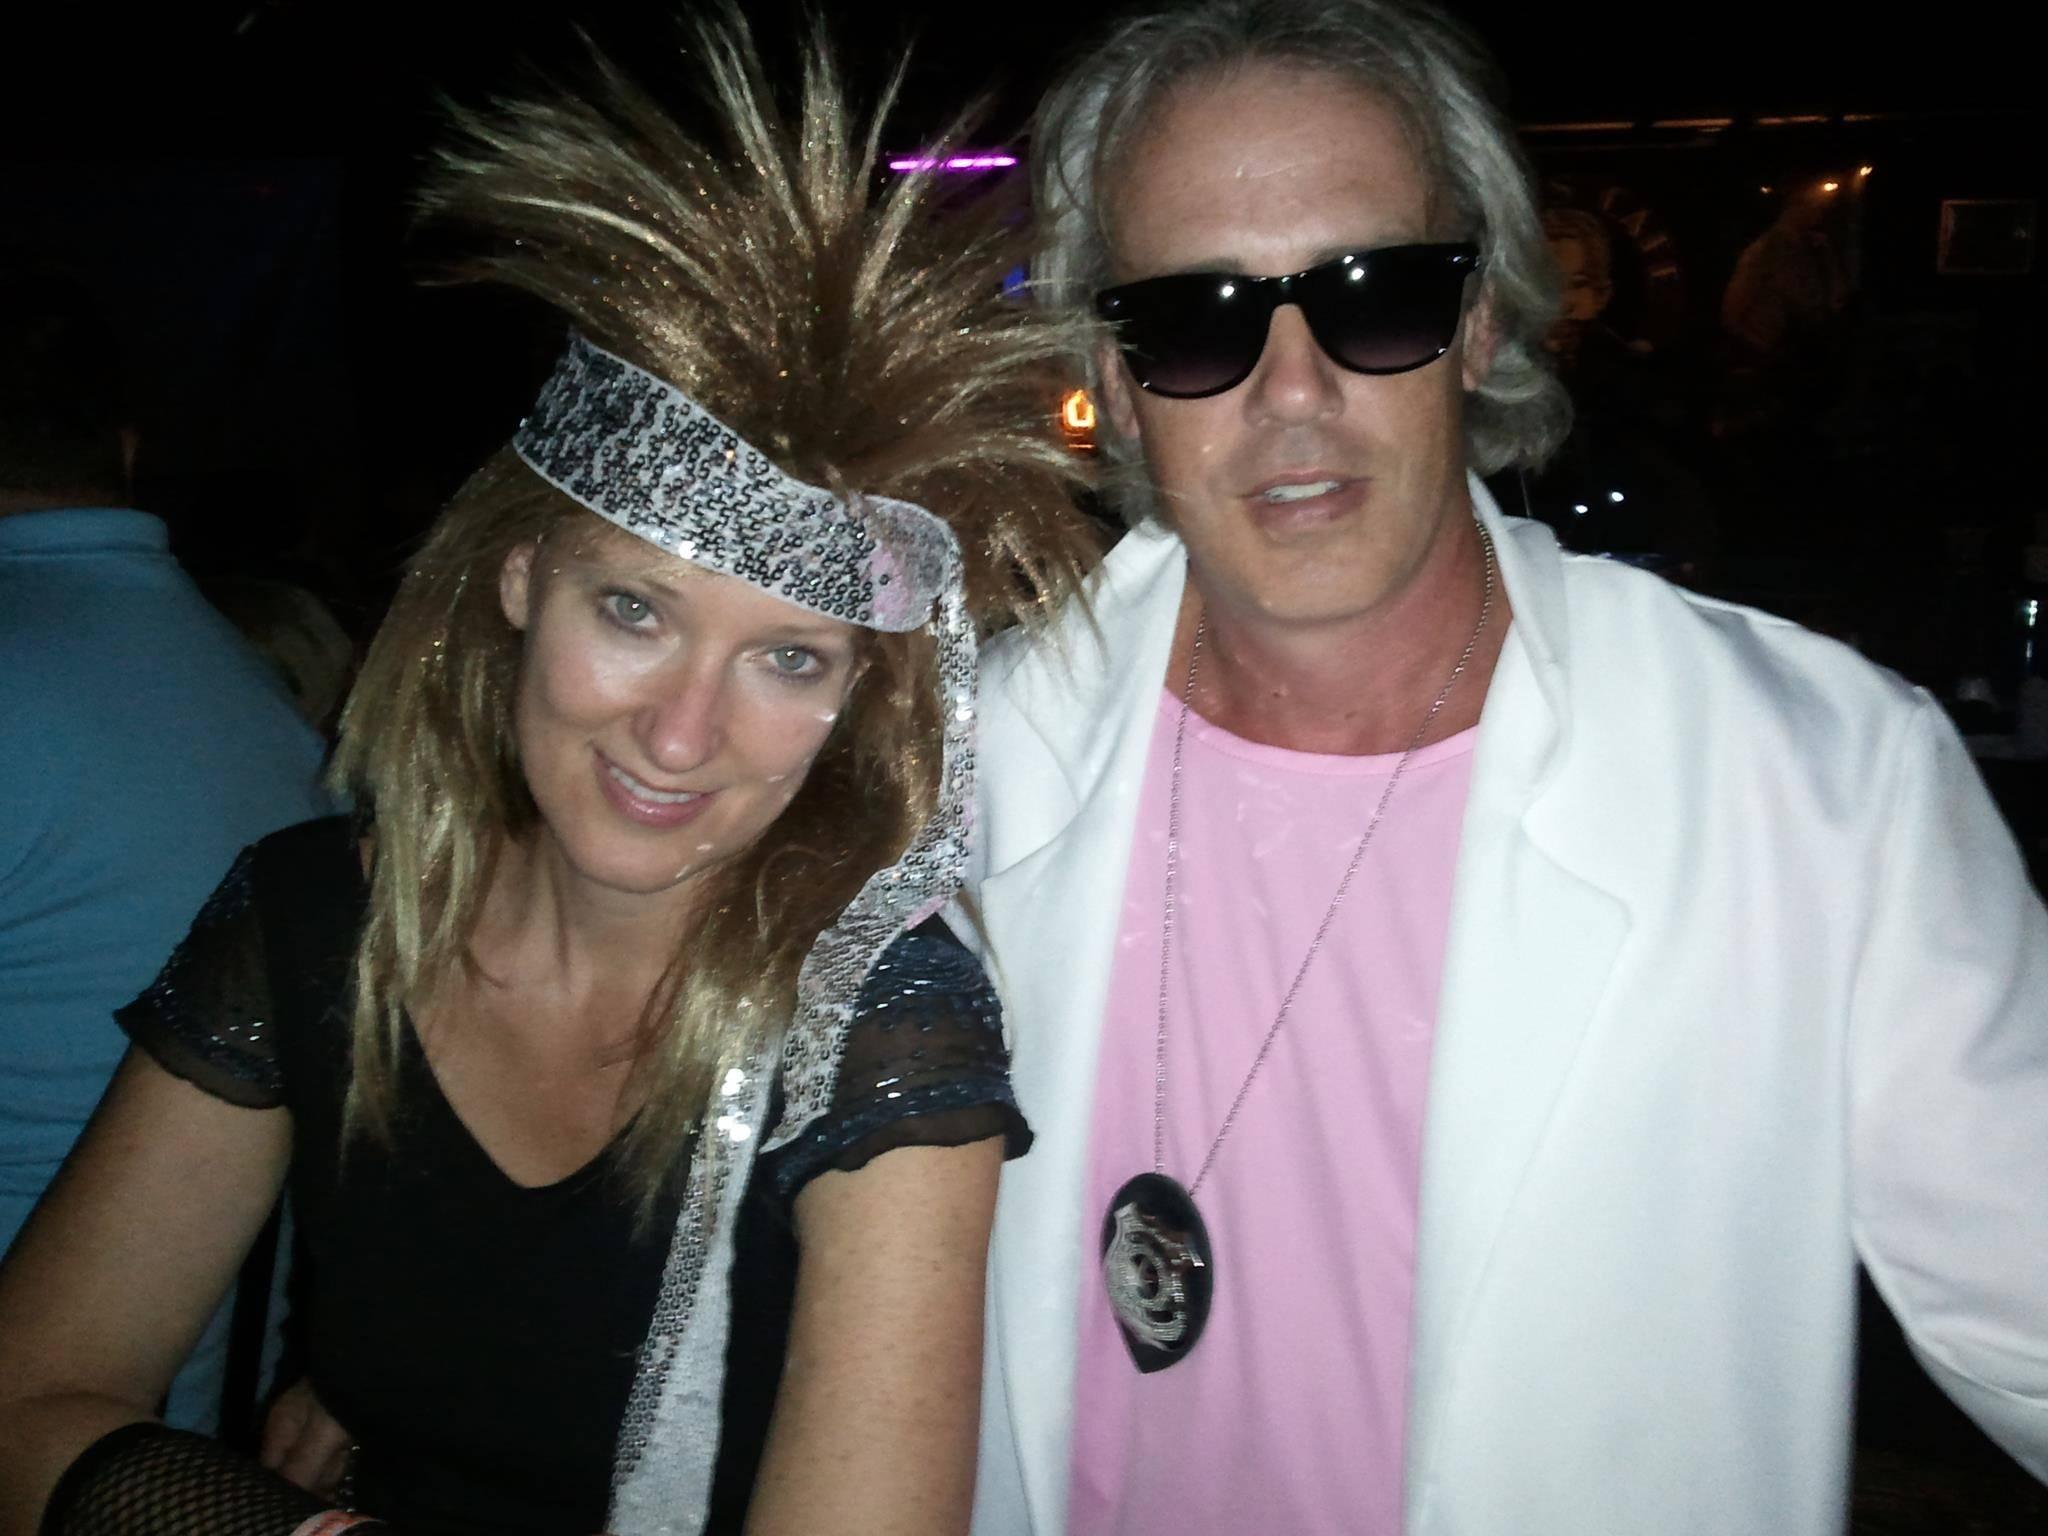 80s Rock & Don Johnson